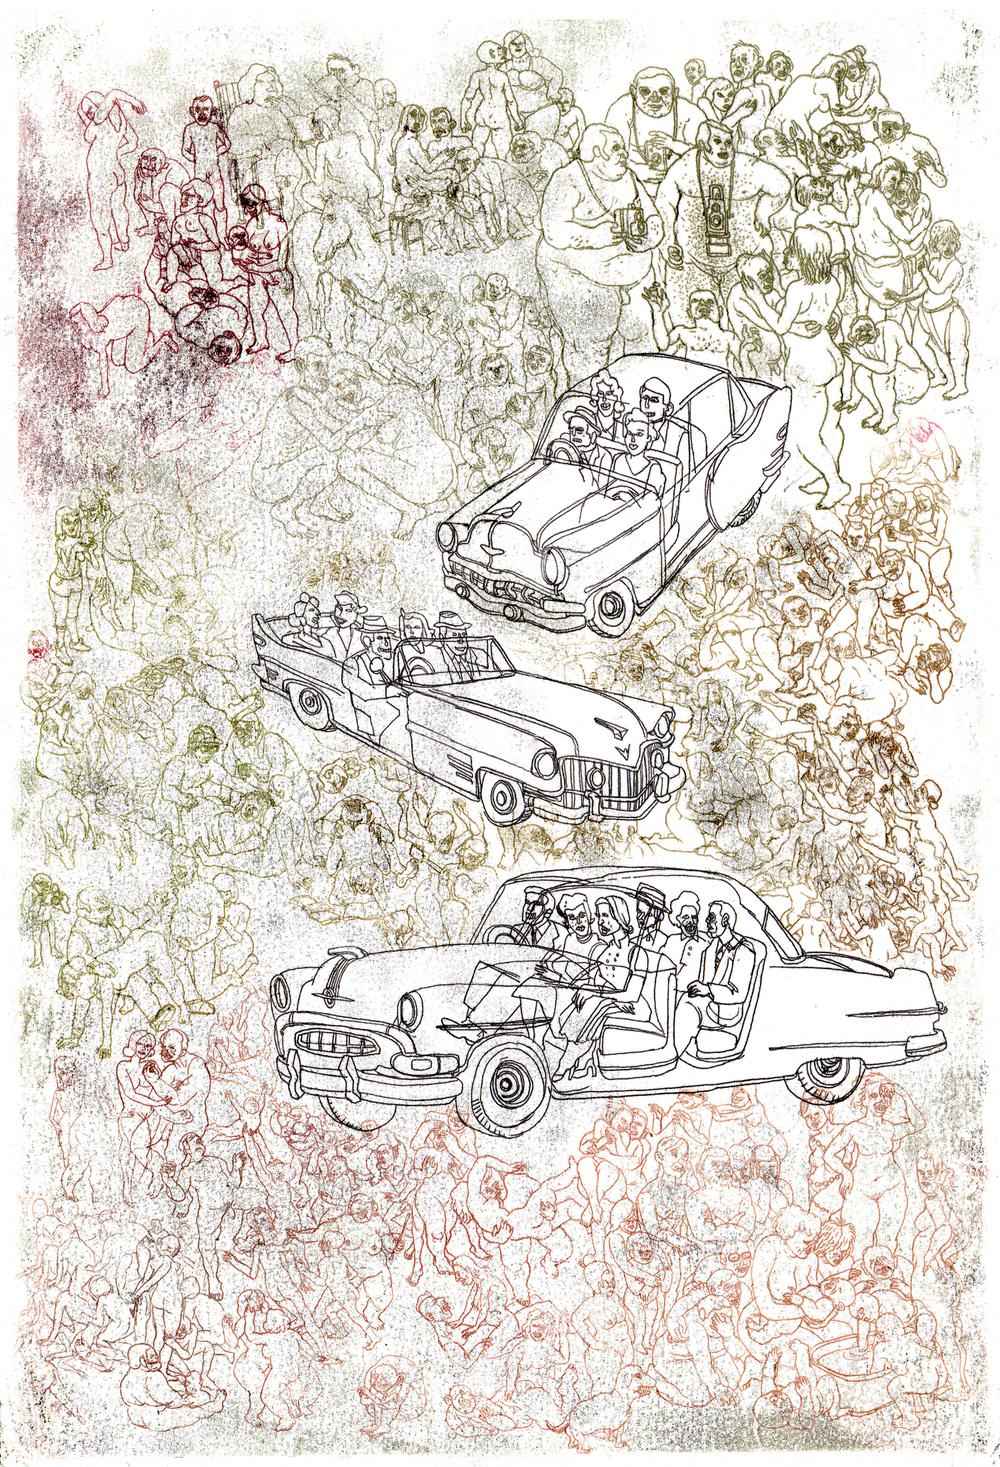 car peoples - Copy - Copy (2) copy.JPG